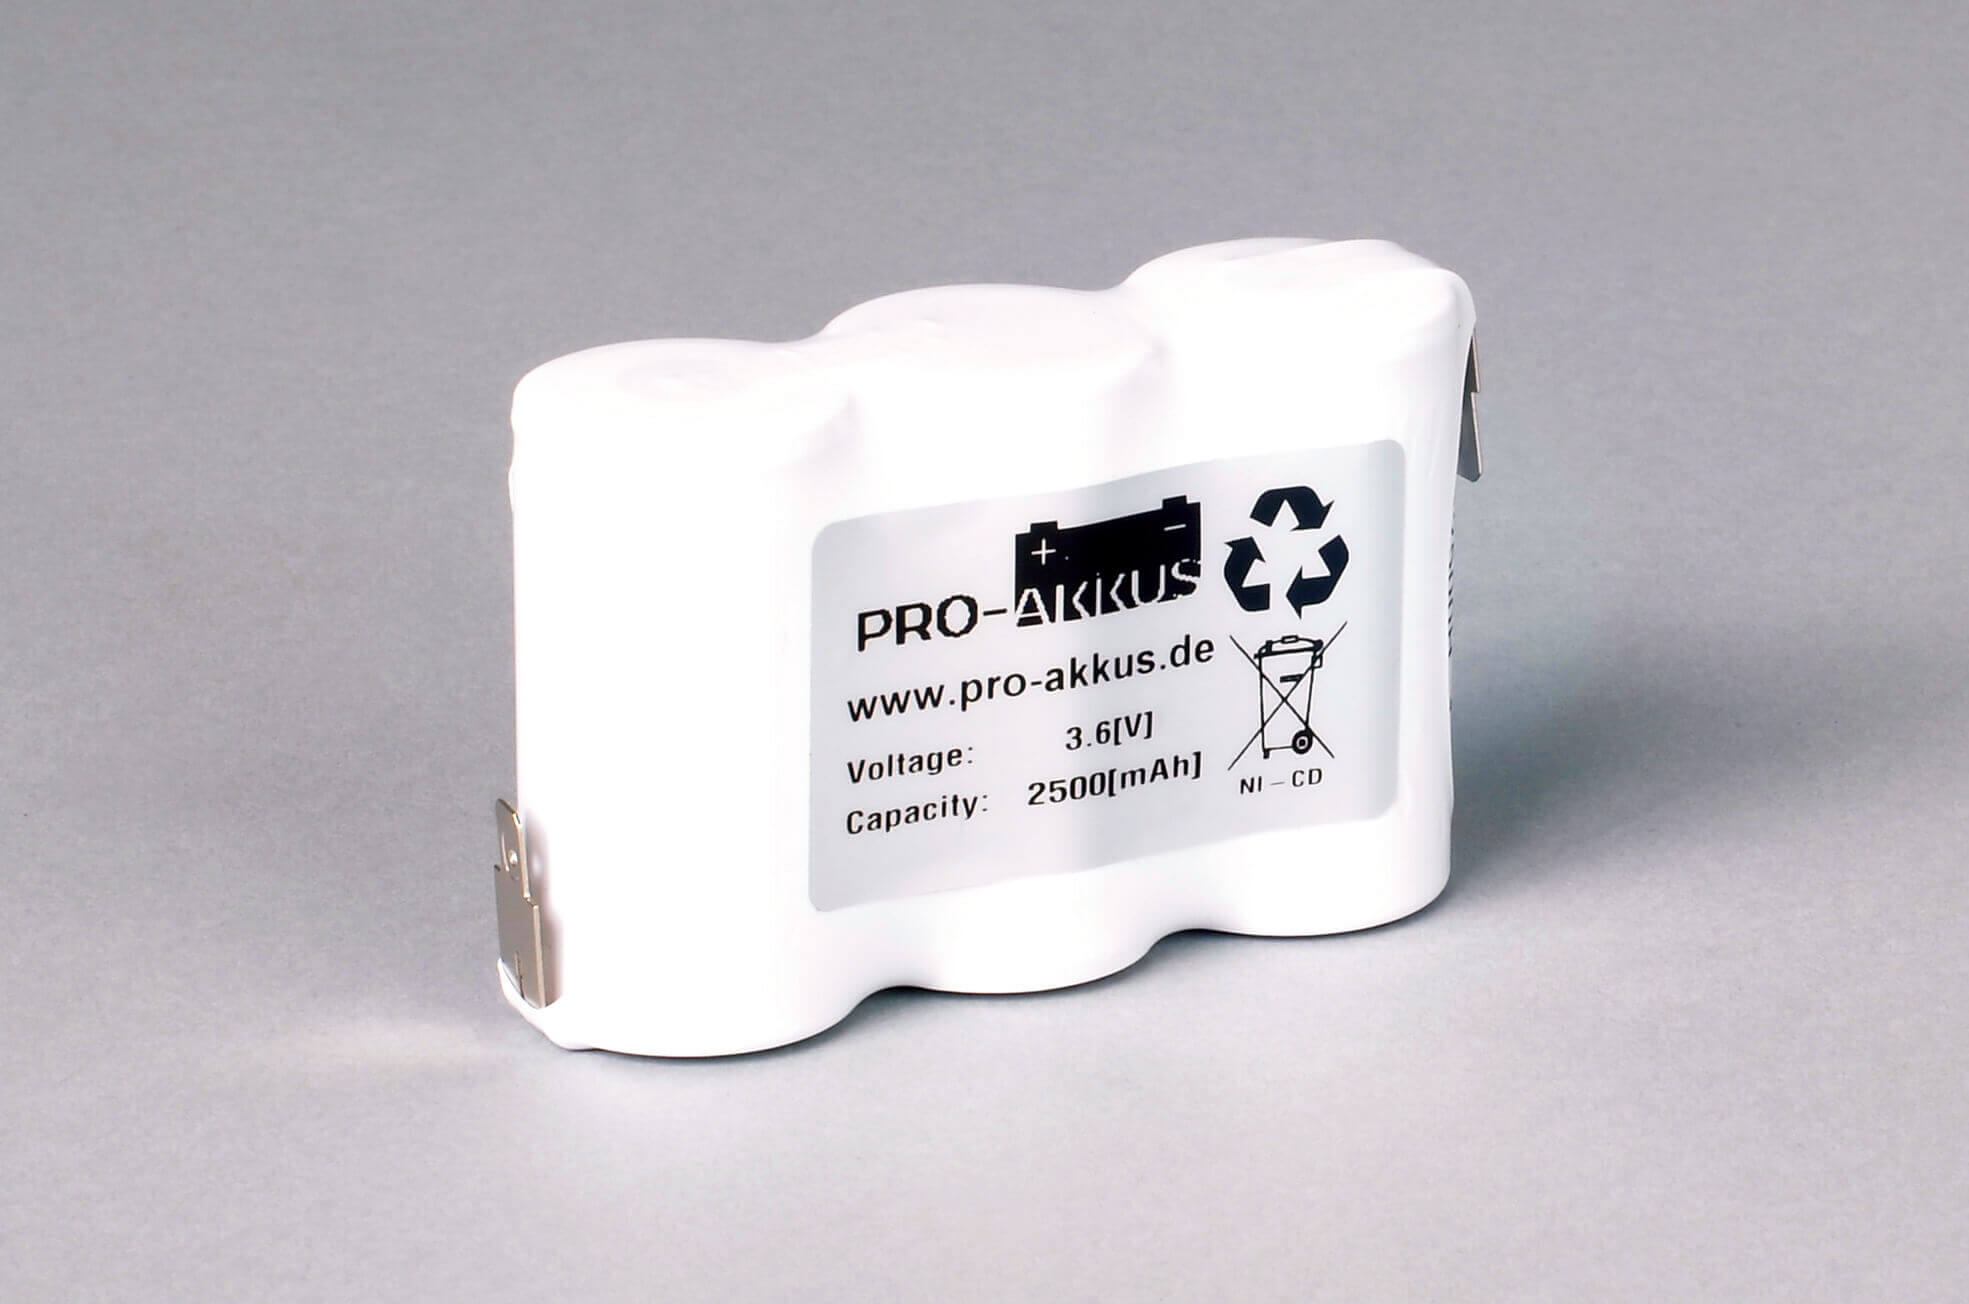 Ni-Cd Akkupack Notlicht Notbeleuchtung 3,6V / 2500mAh (2,5Ah) F3x1 Reihe, Faston Anschlüsse